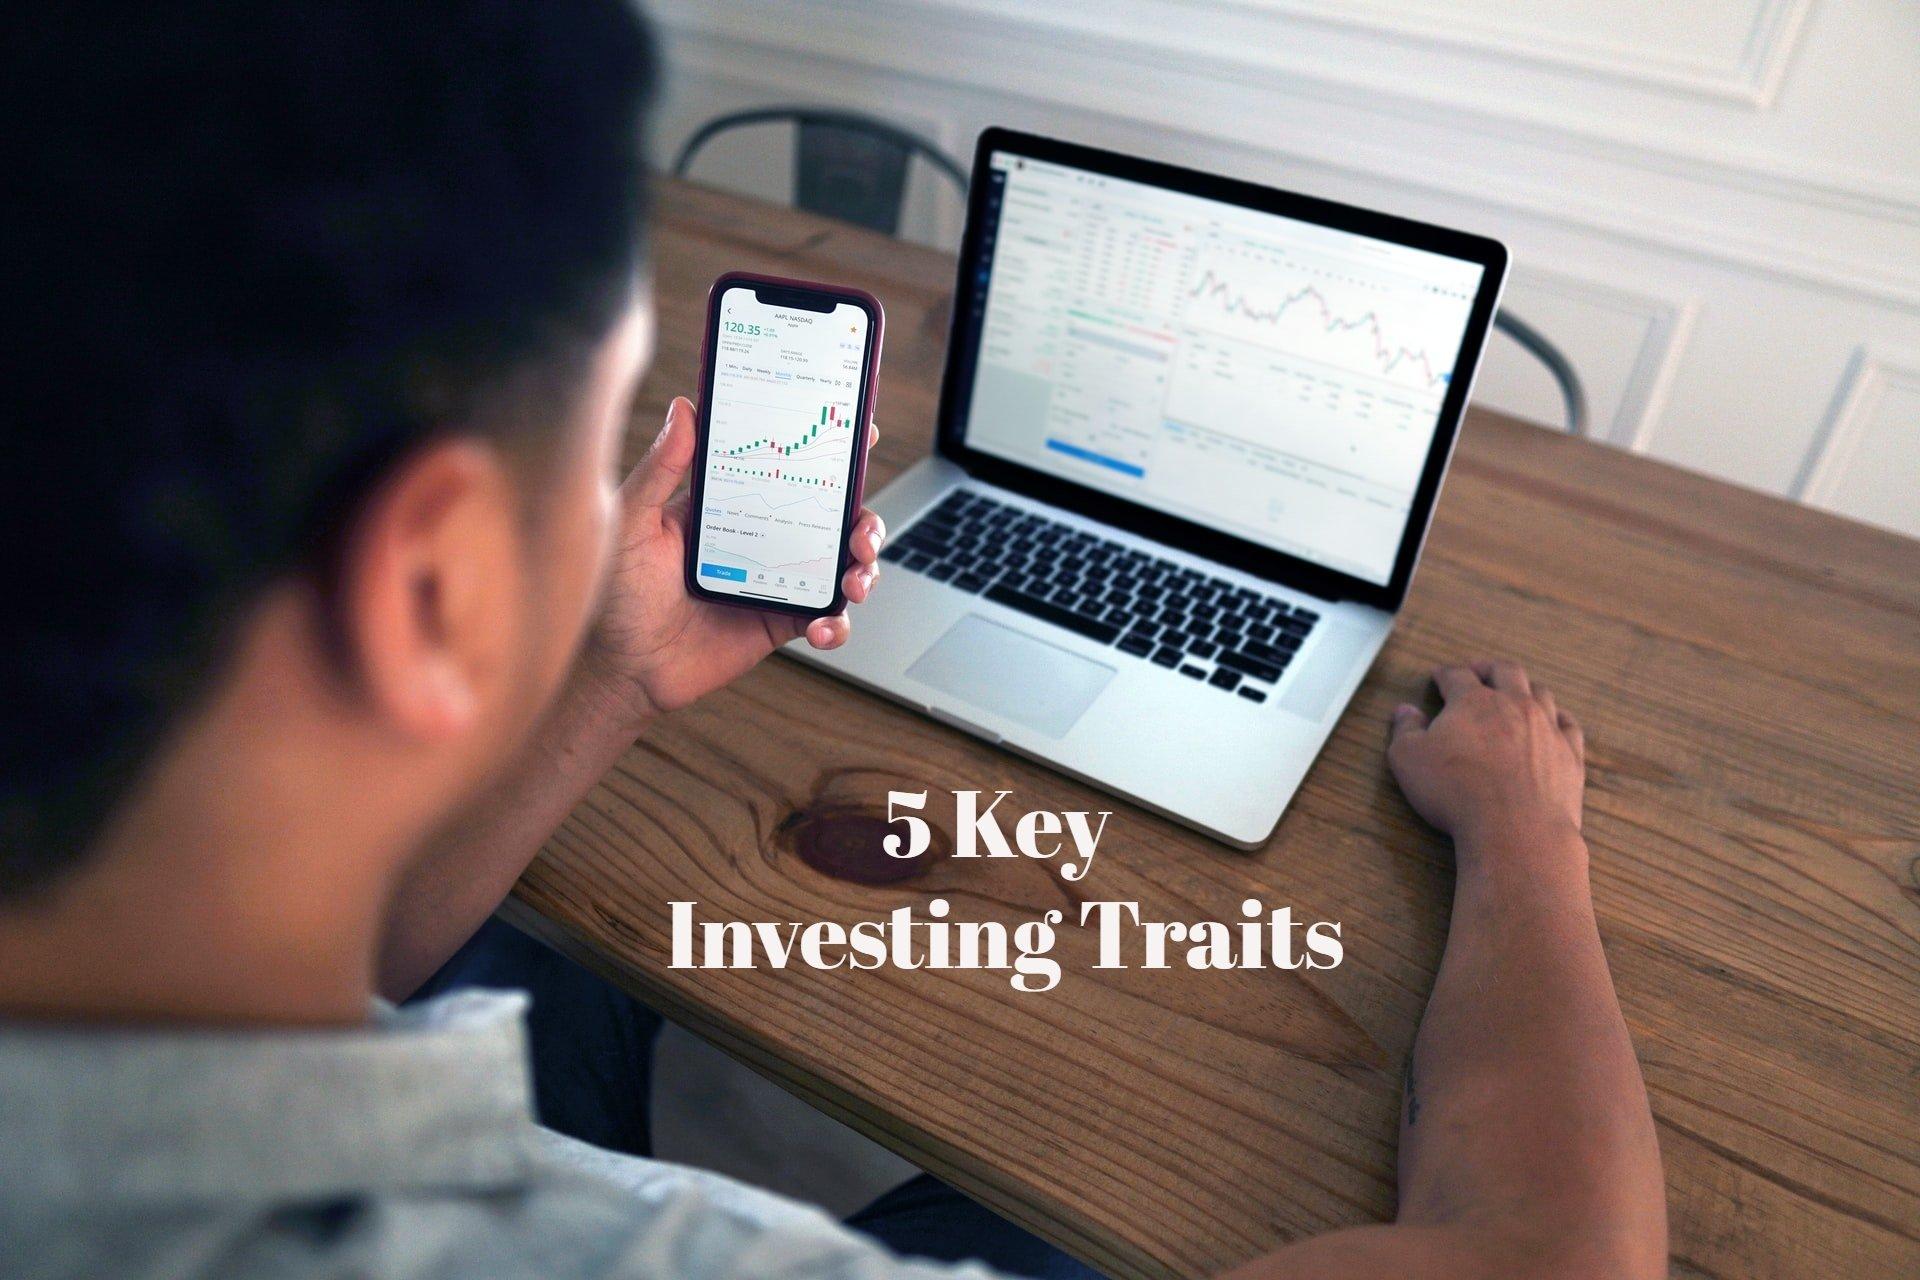 5 Key Investing Traits